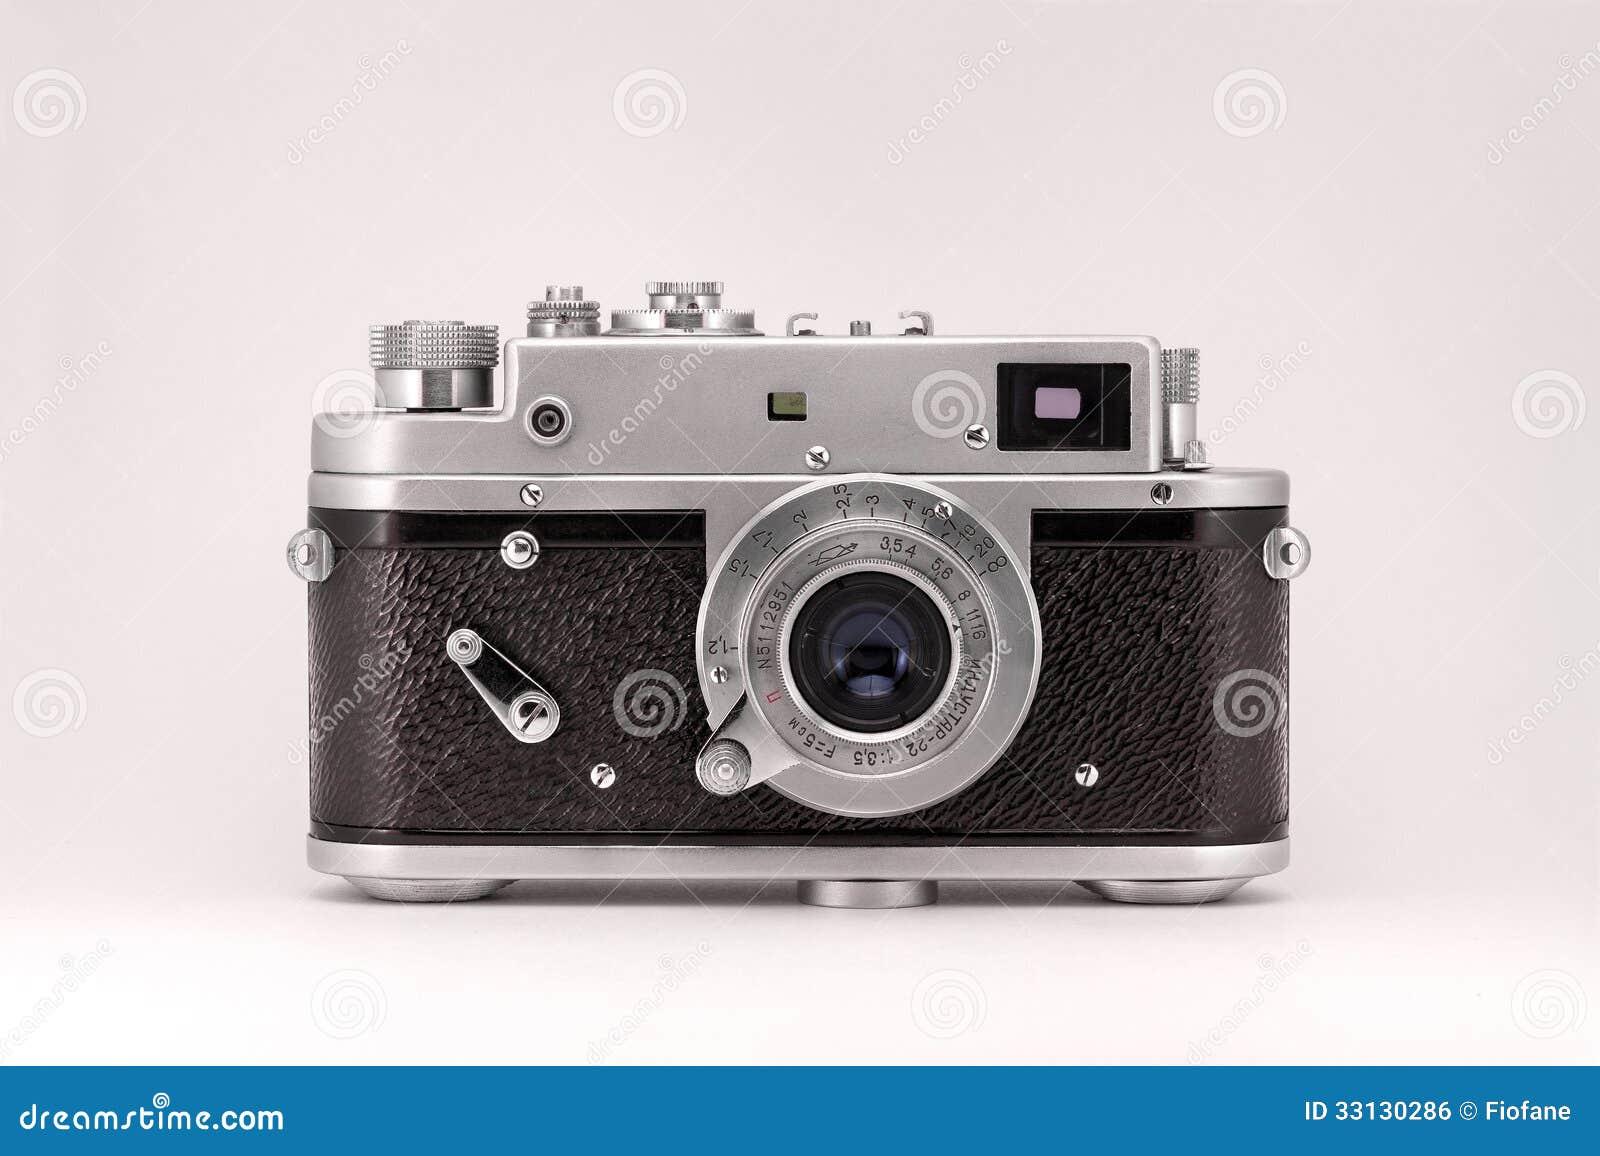 Old vintage camera royalty free stock image image 33130286 for Camera gratis